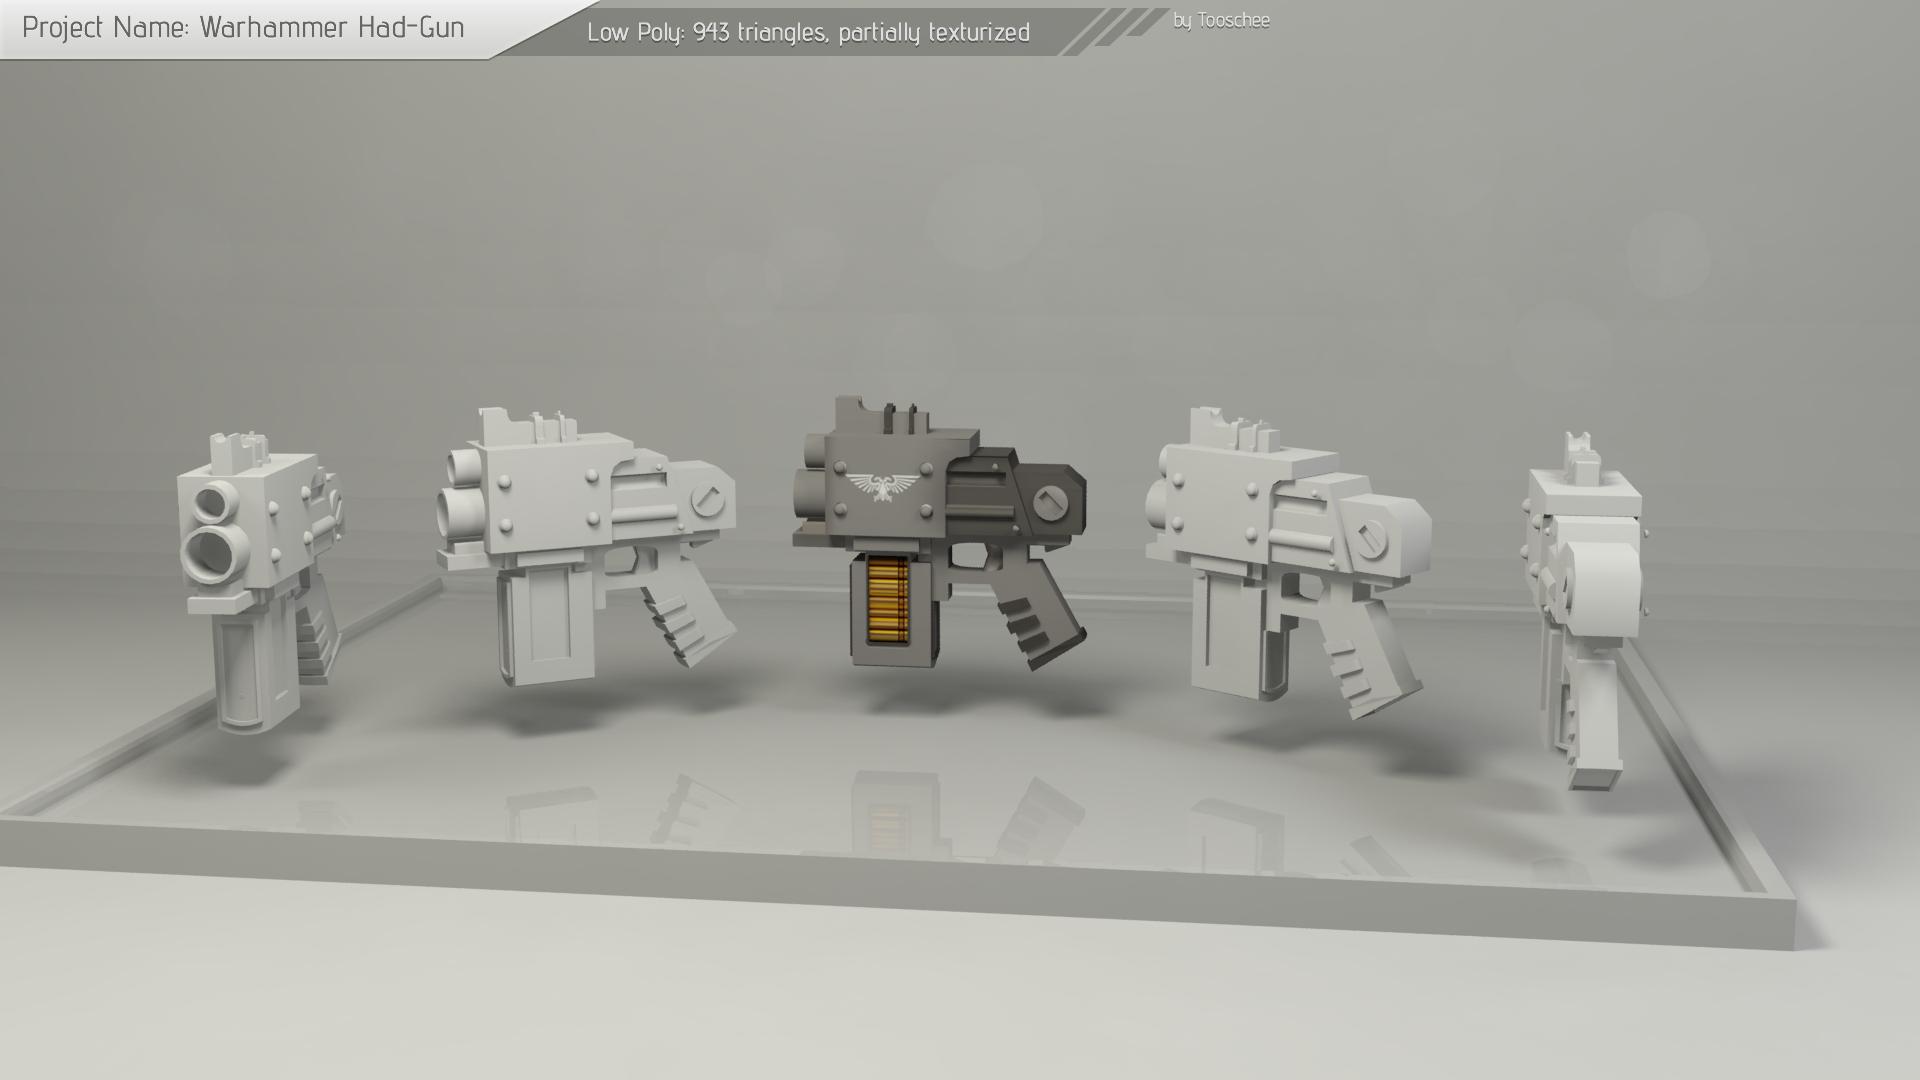 Warhammer Hand-Gun Model